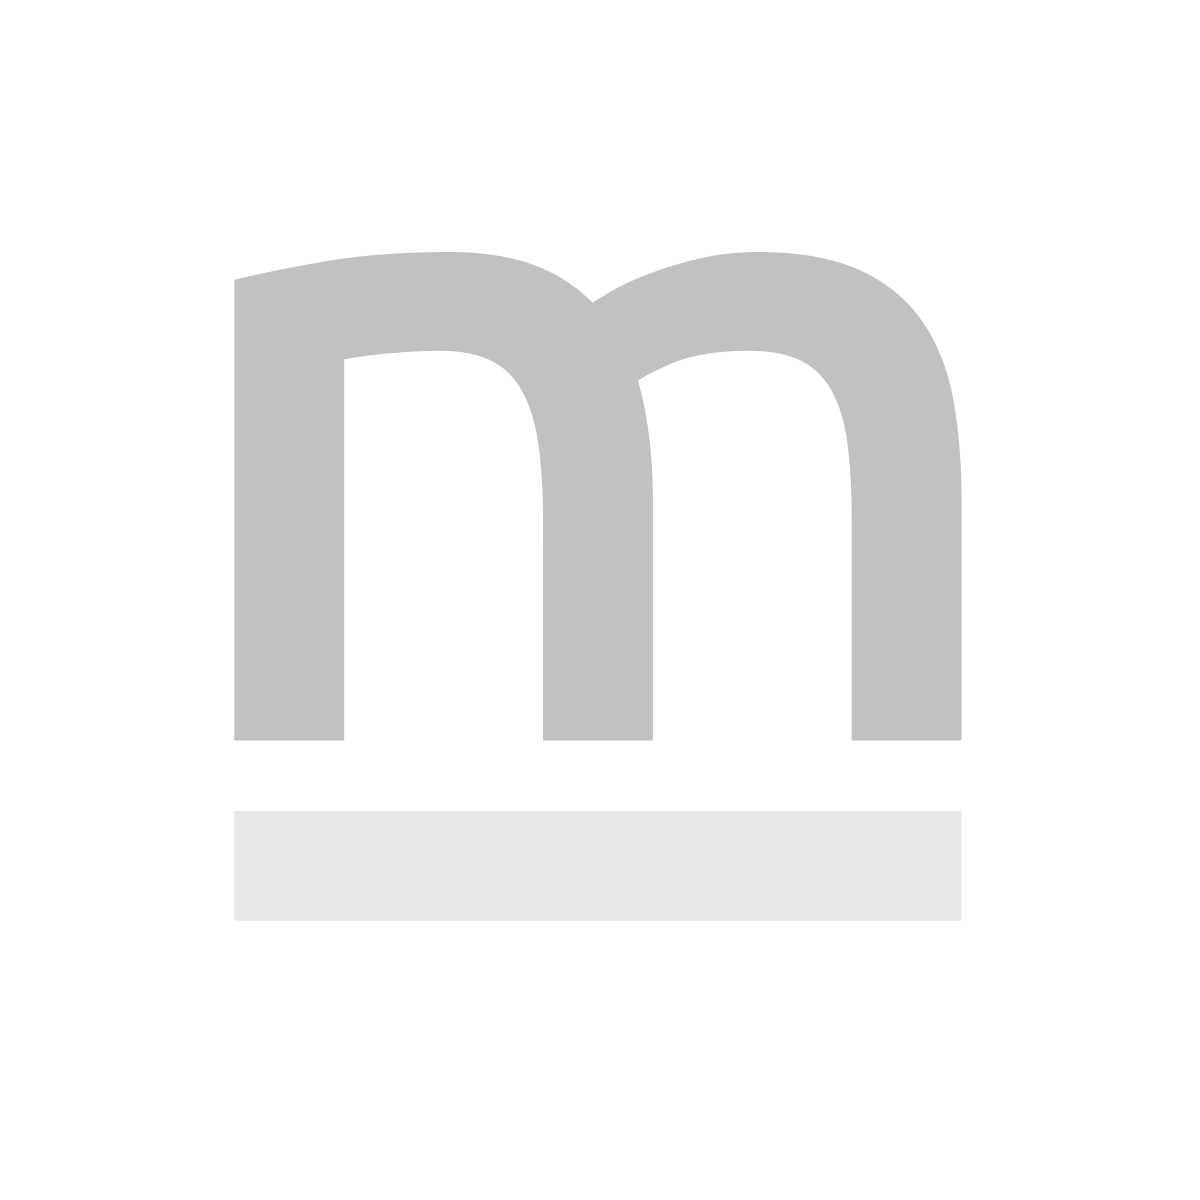 Szafka łazienkowa NICEA HOLOGRAM D40 L biała